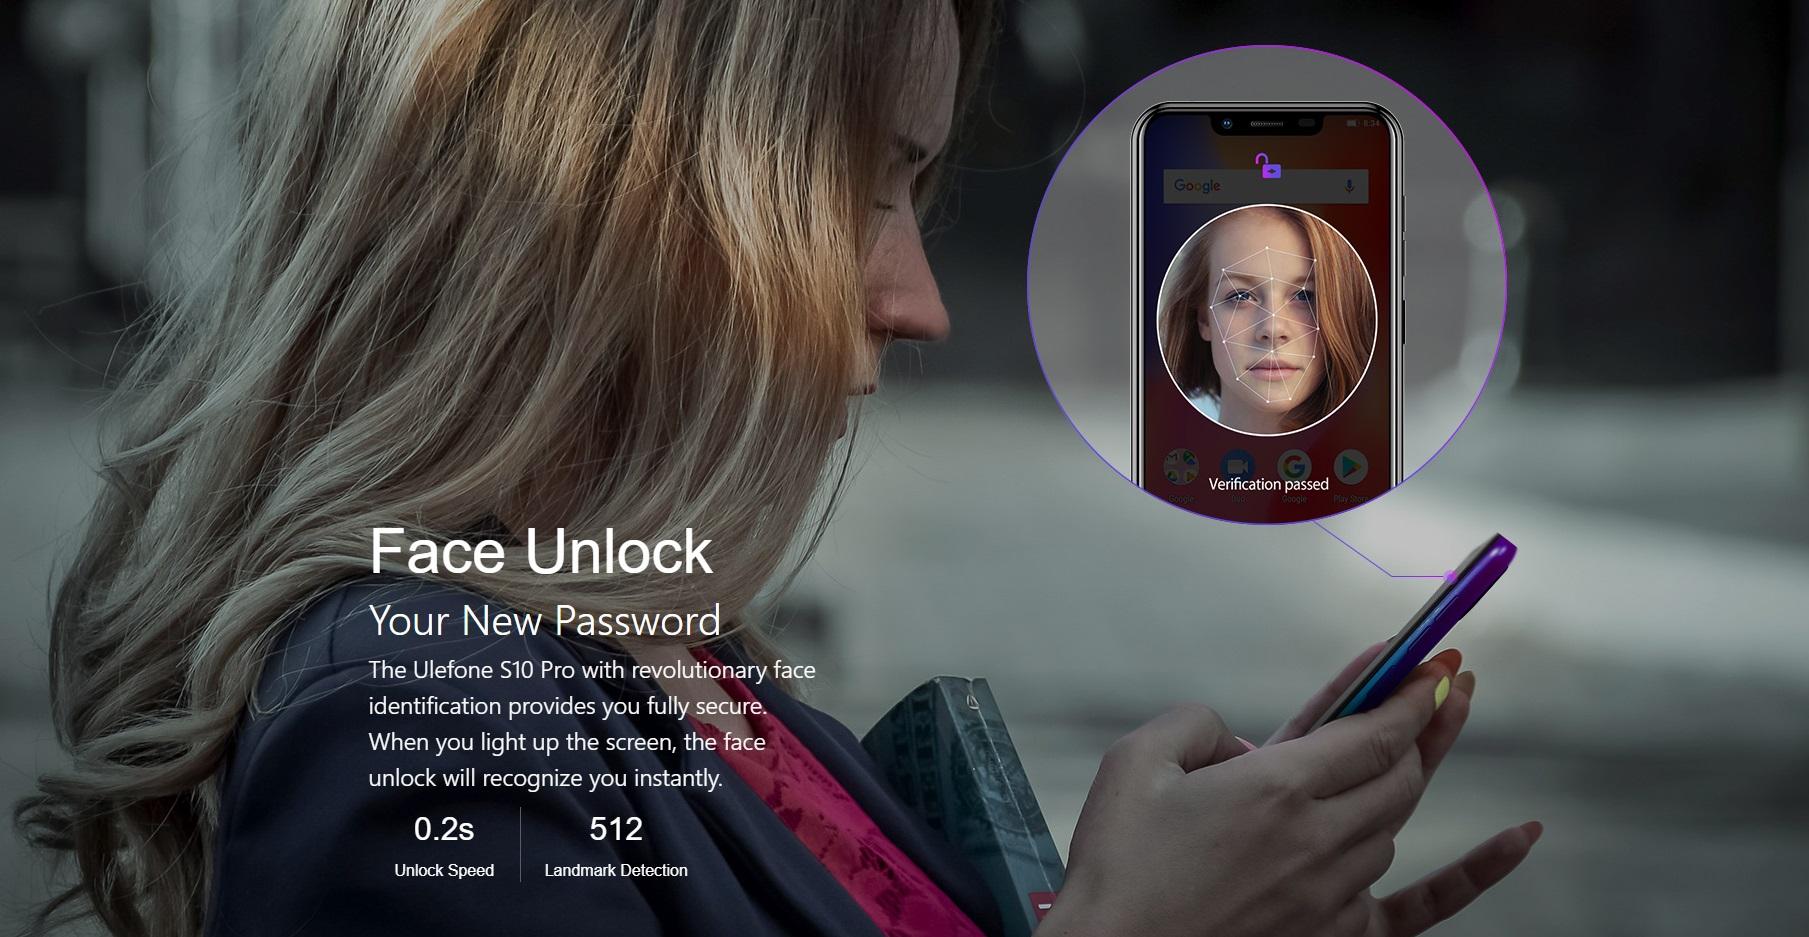 ulefone s10 pro face unlock